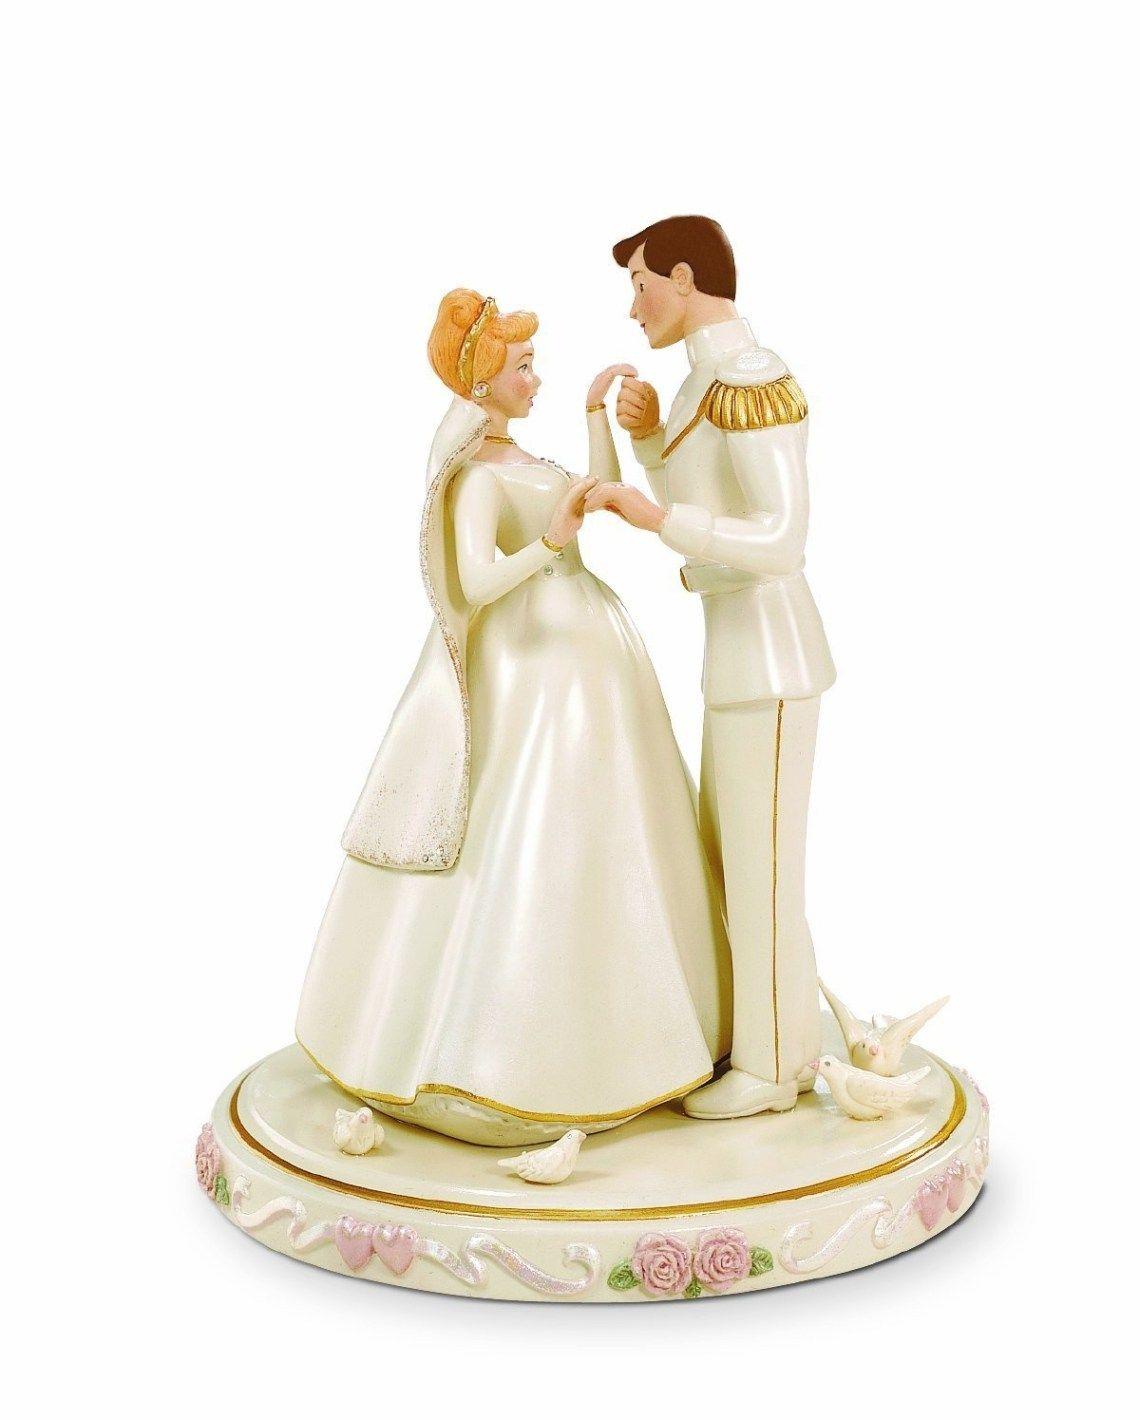 Download Cinderella Wedding Cake Topper | Wedding Corners In Lenox Wedding  Cake Topper   Download Cinderella